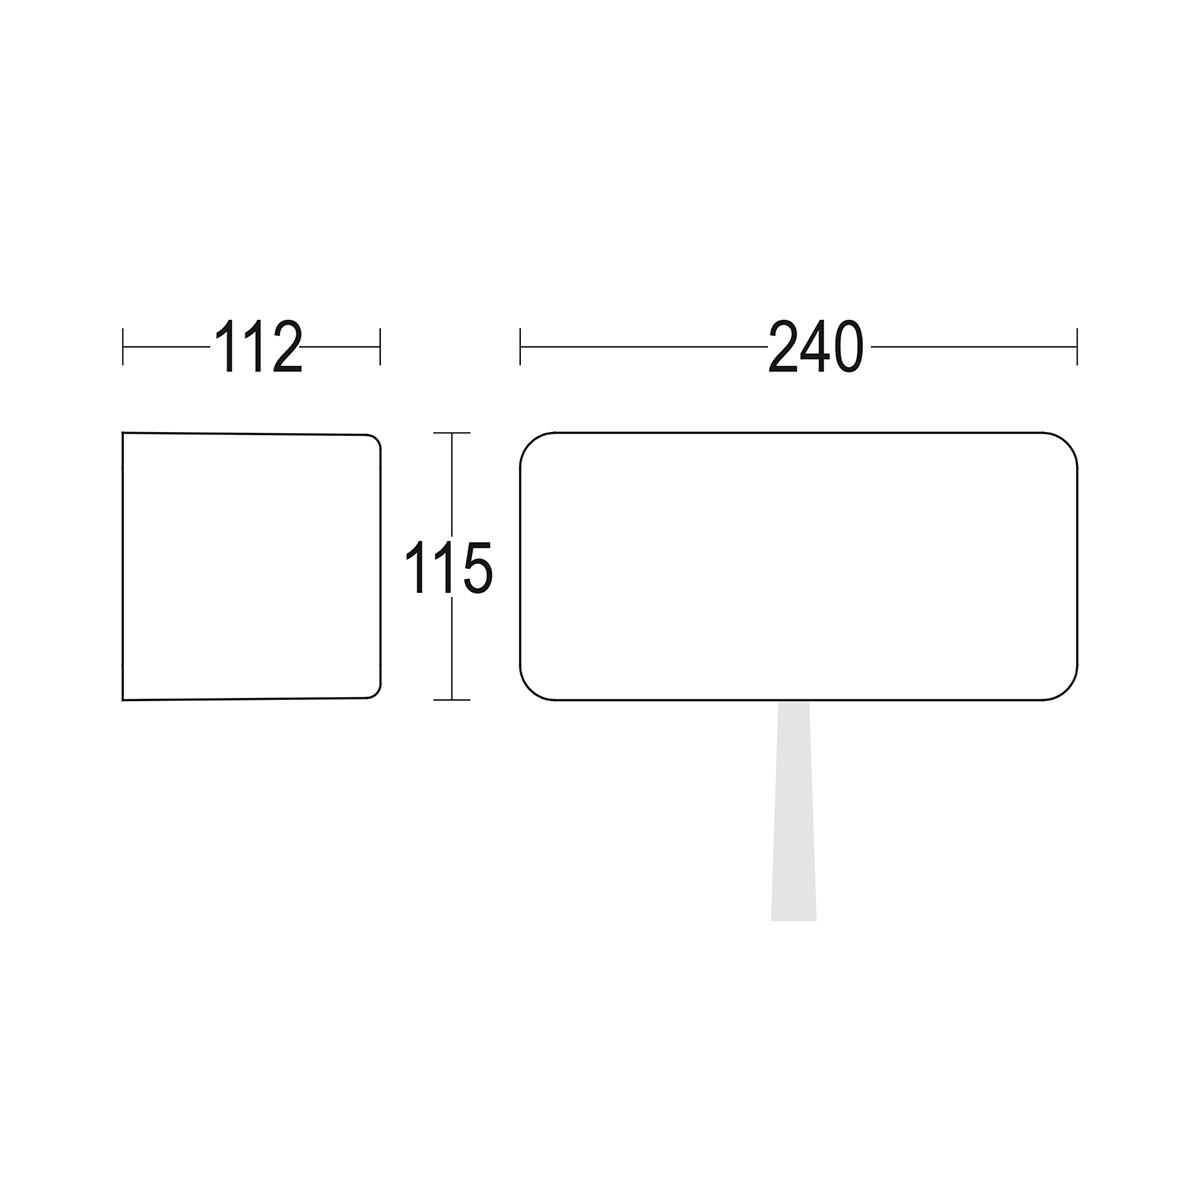 чертеж Modo 1Lens 240x115 Ghidini уличный светильник GH1015.BGXT300EN